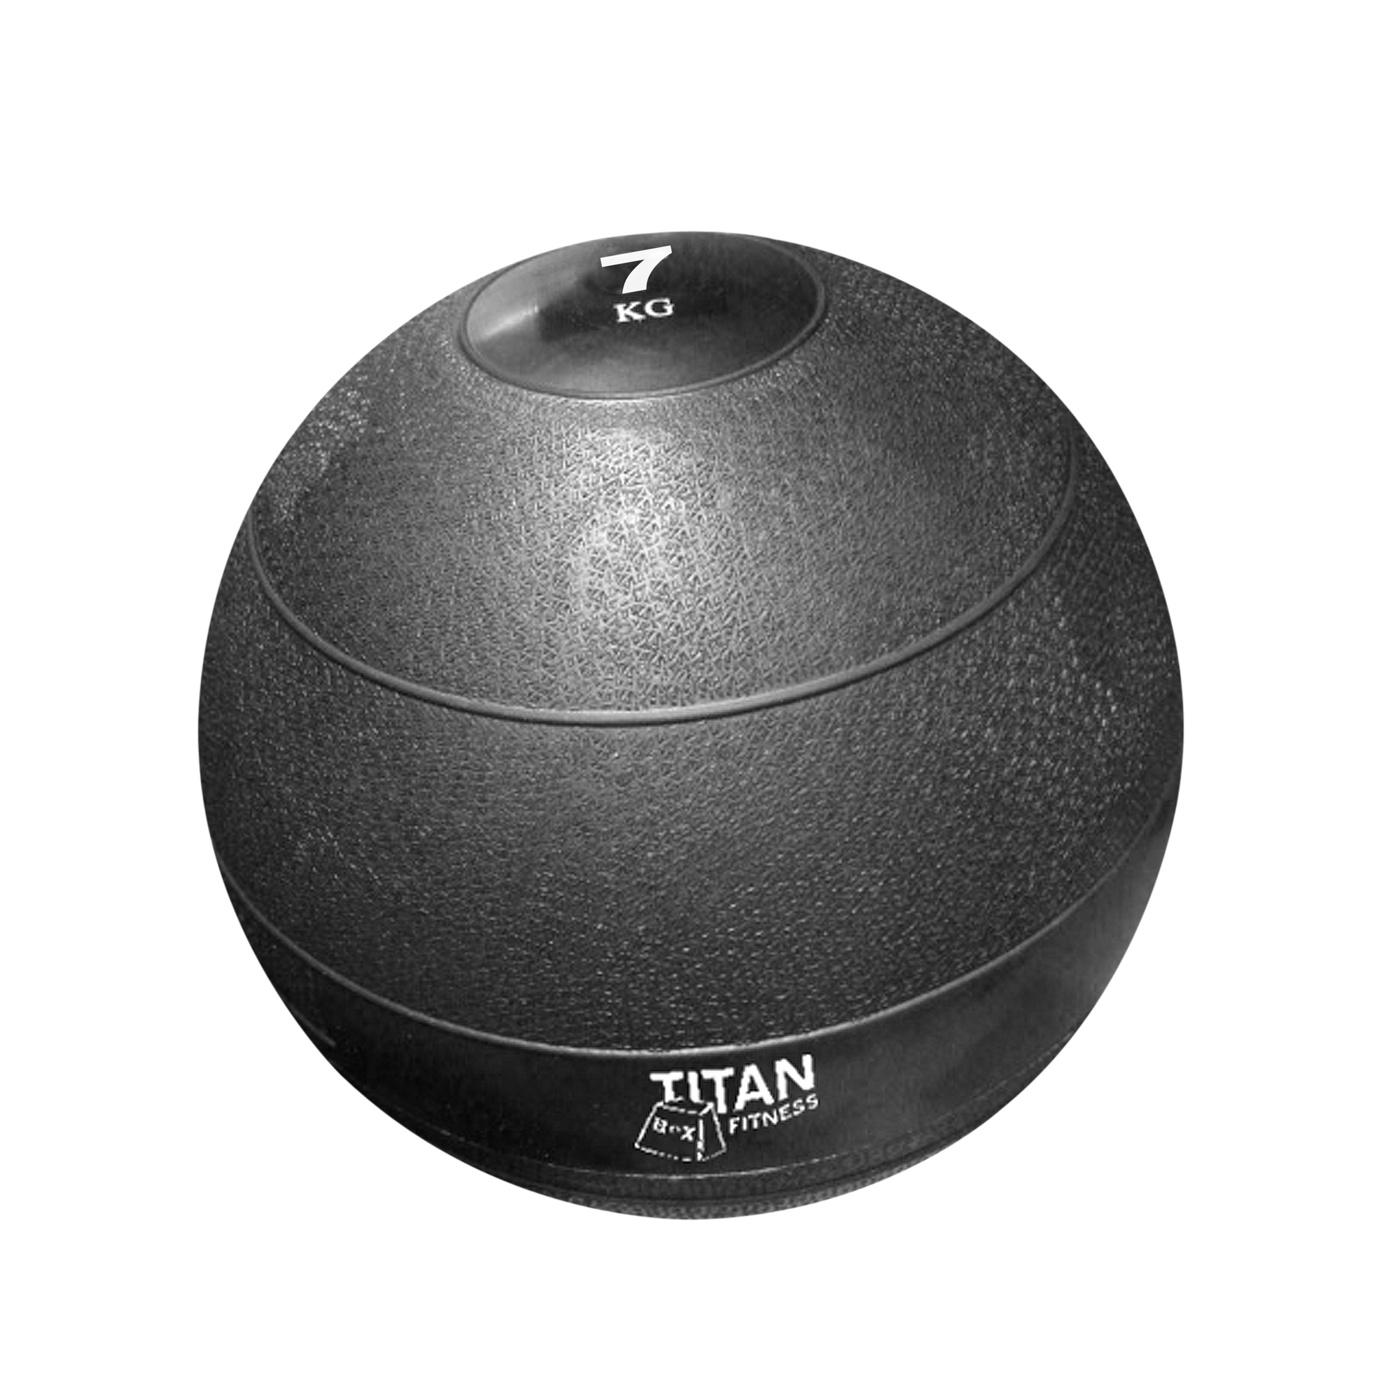 Titan_Box_SlamTitan_BTitan_Box_Slammeox_Slammemerball_7kg